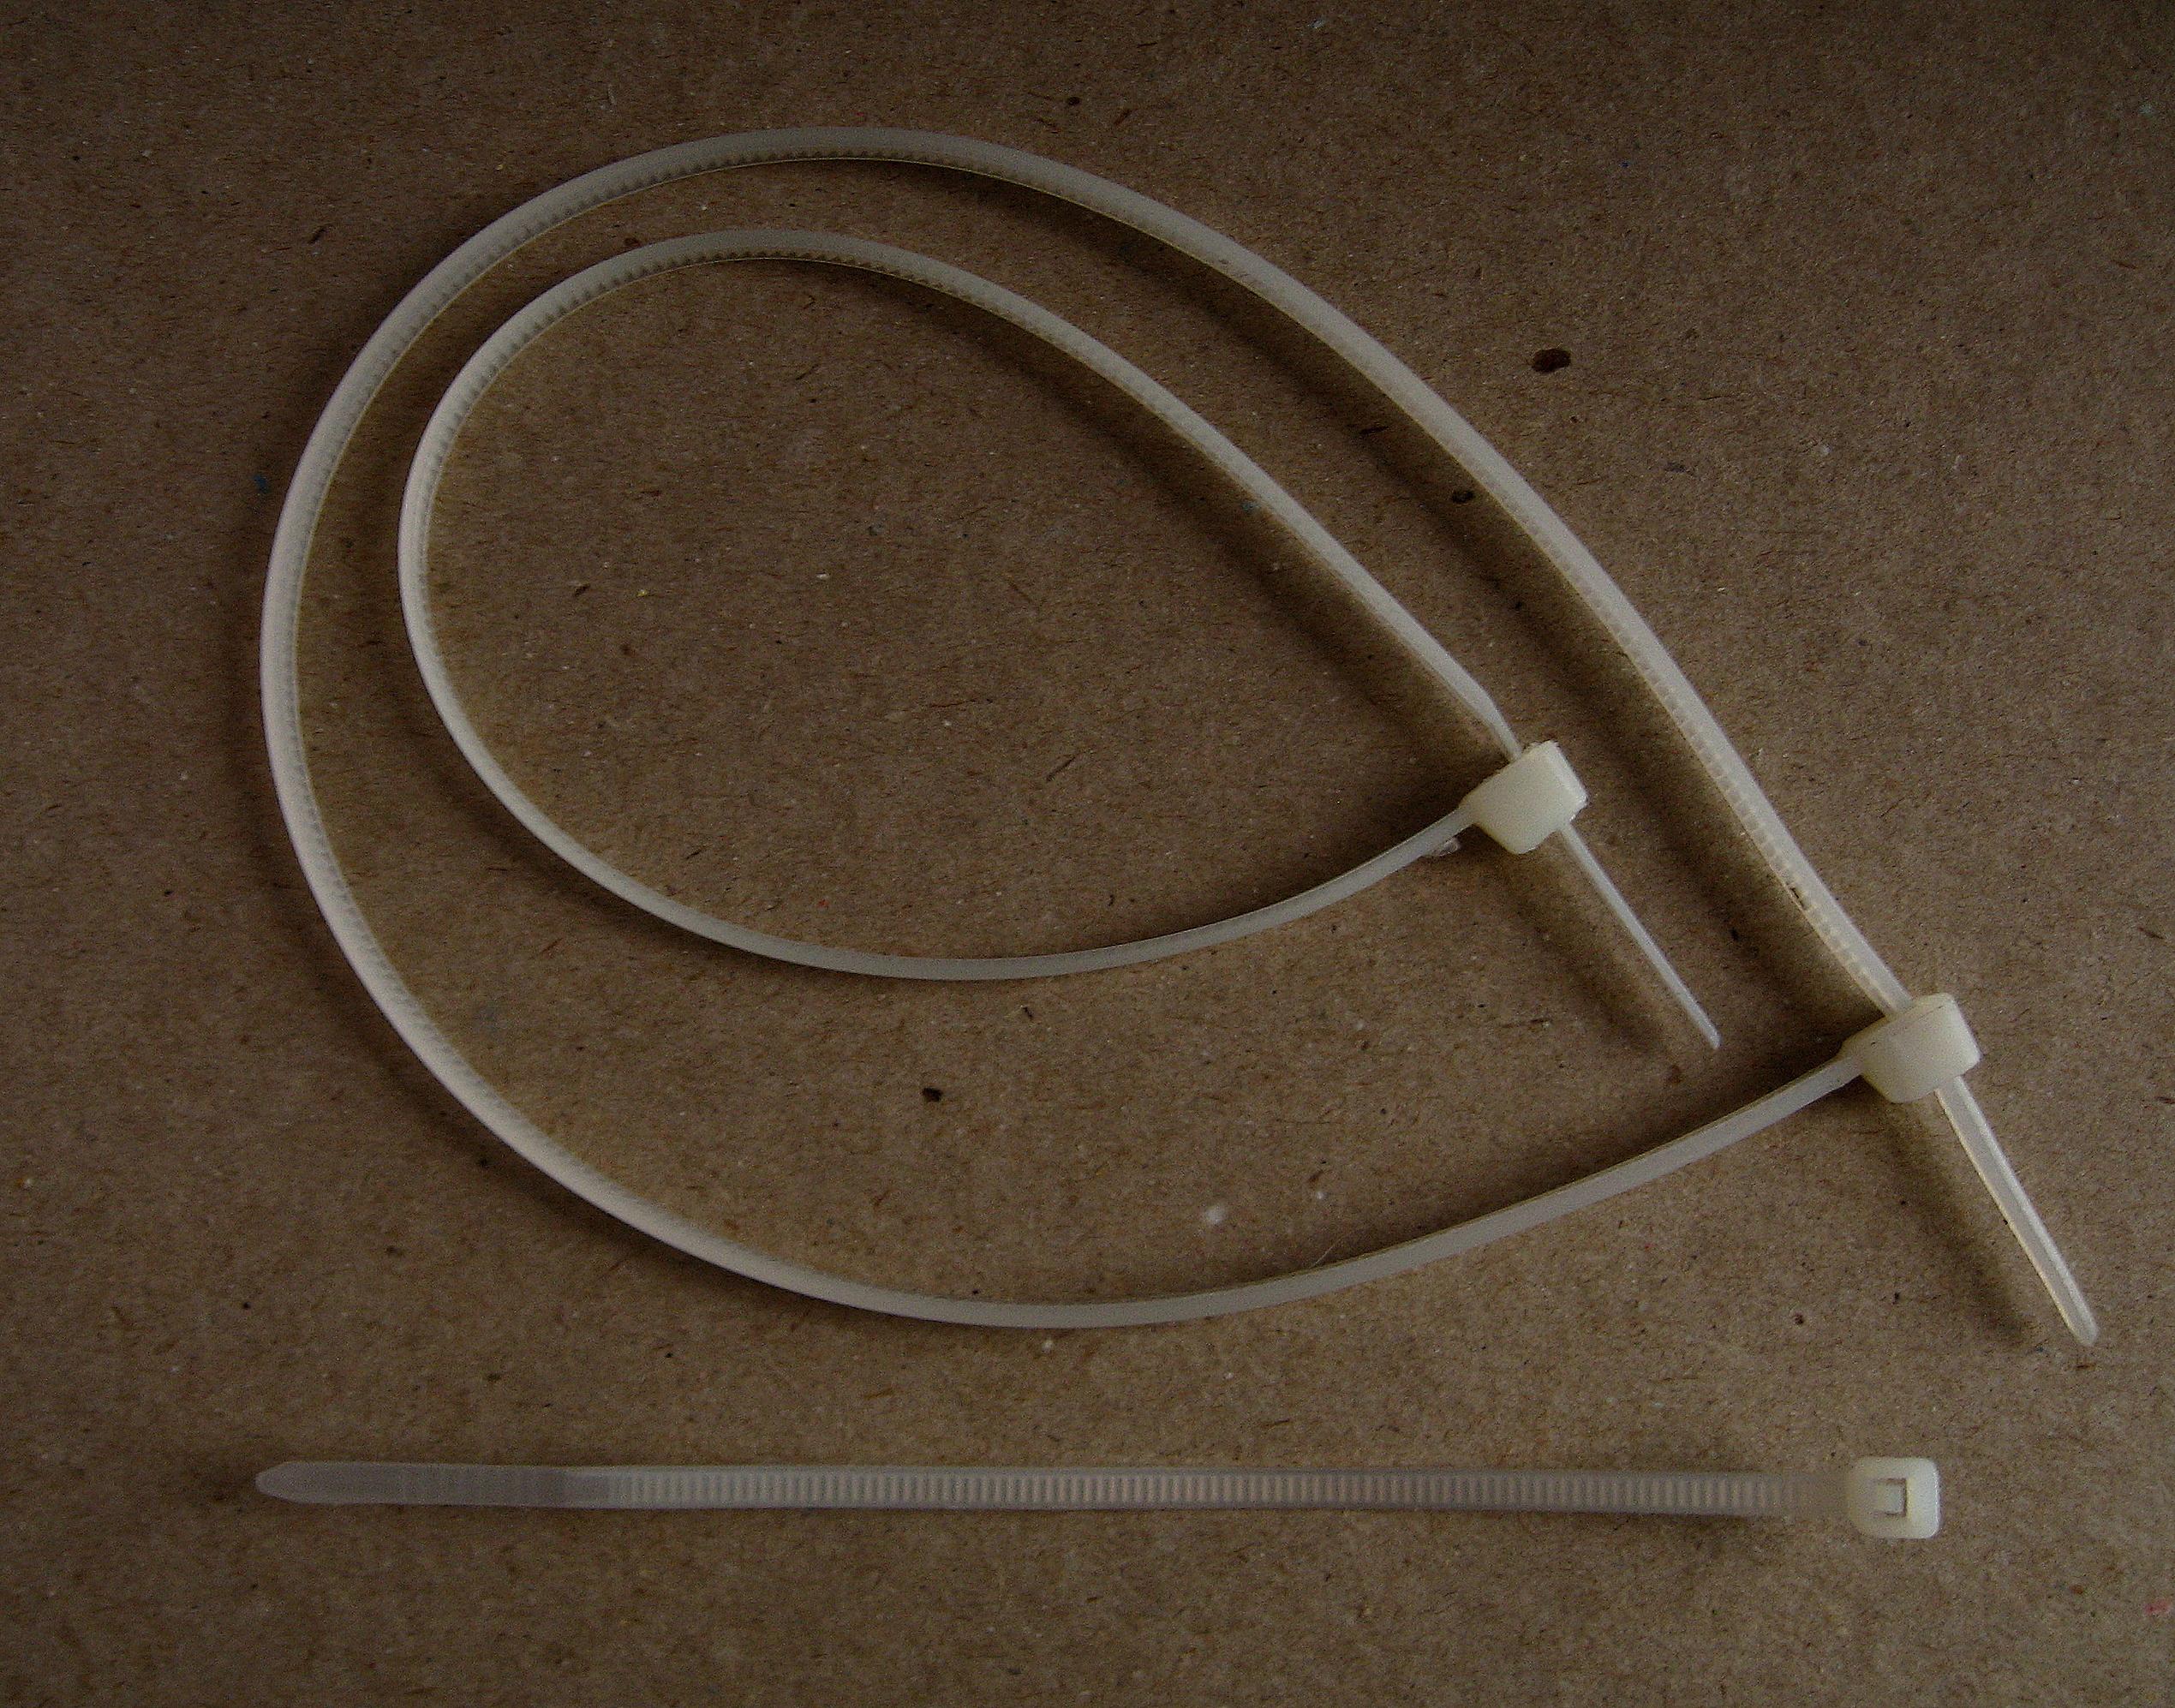 File:Opaski zaciskowe - kabelstrips 3 (ubt).JPG - Wikimedia Commons